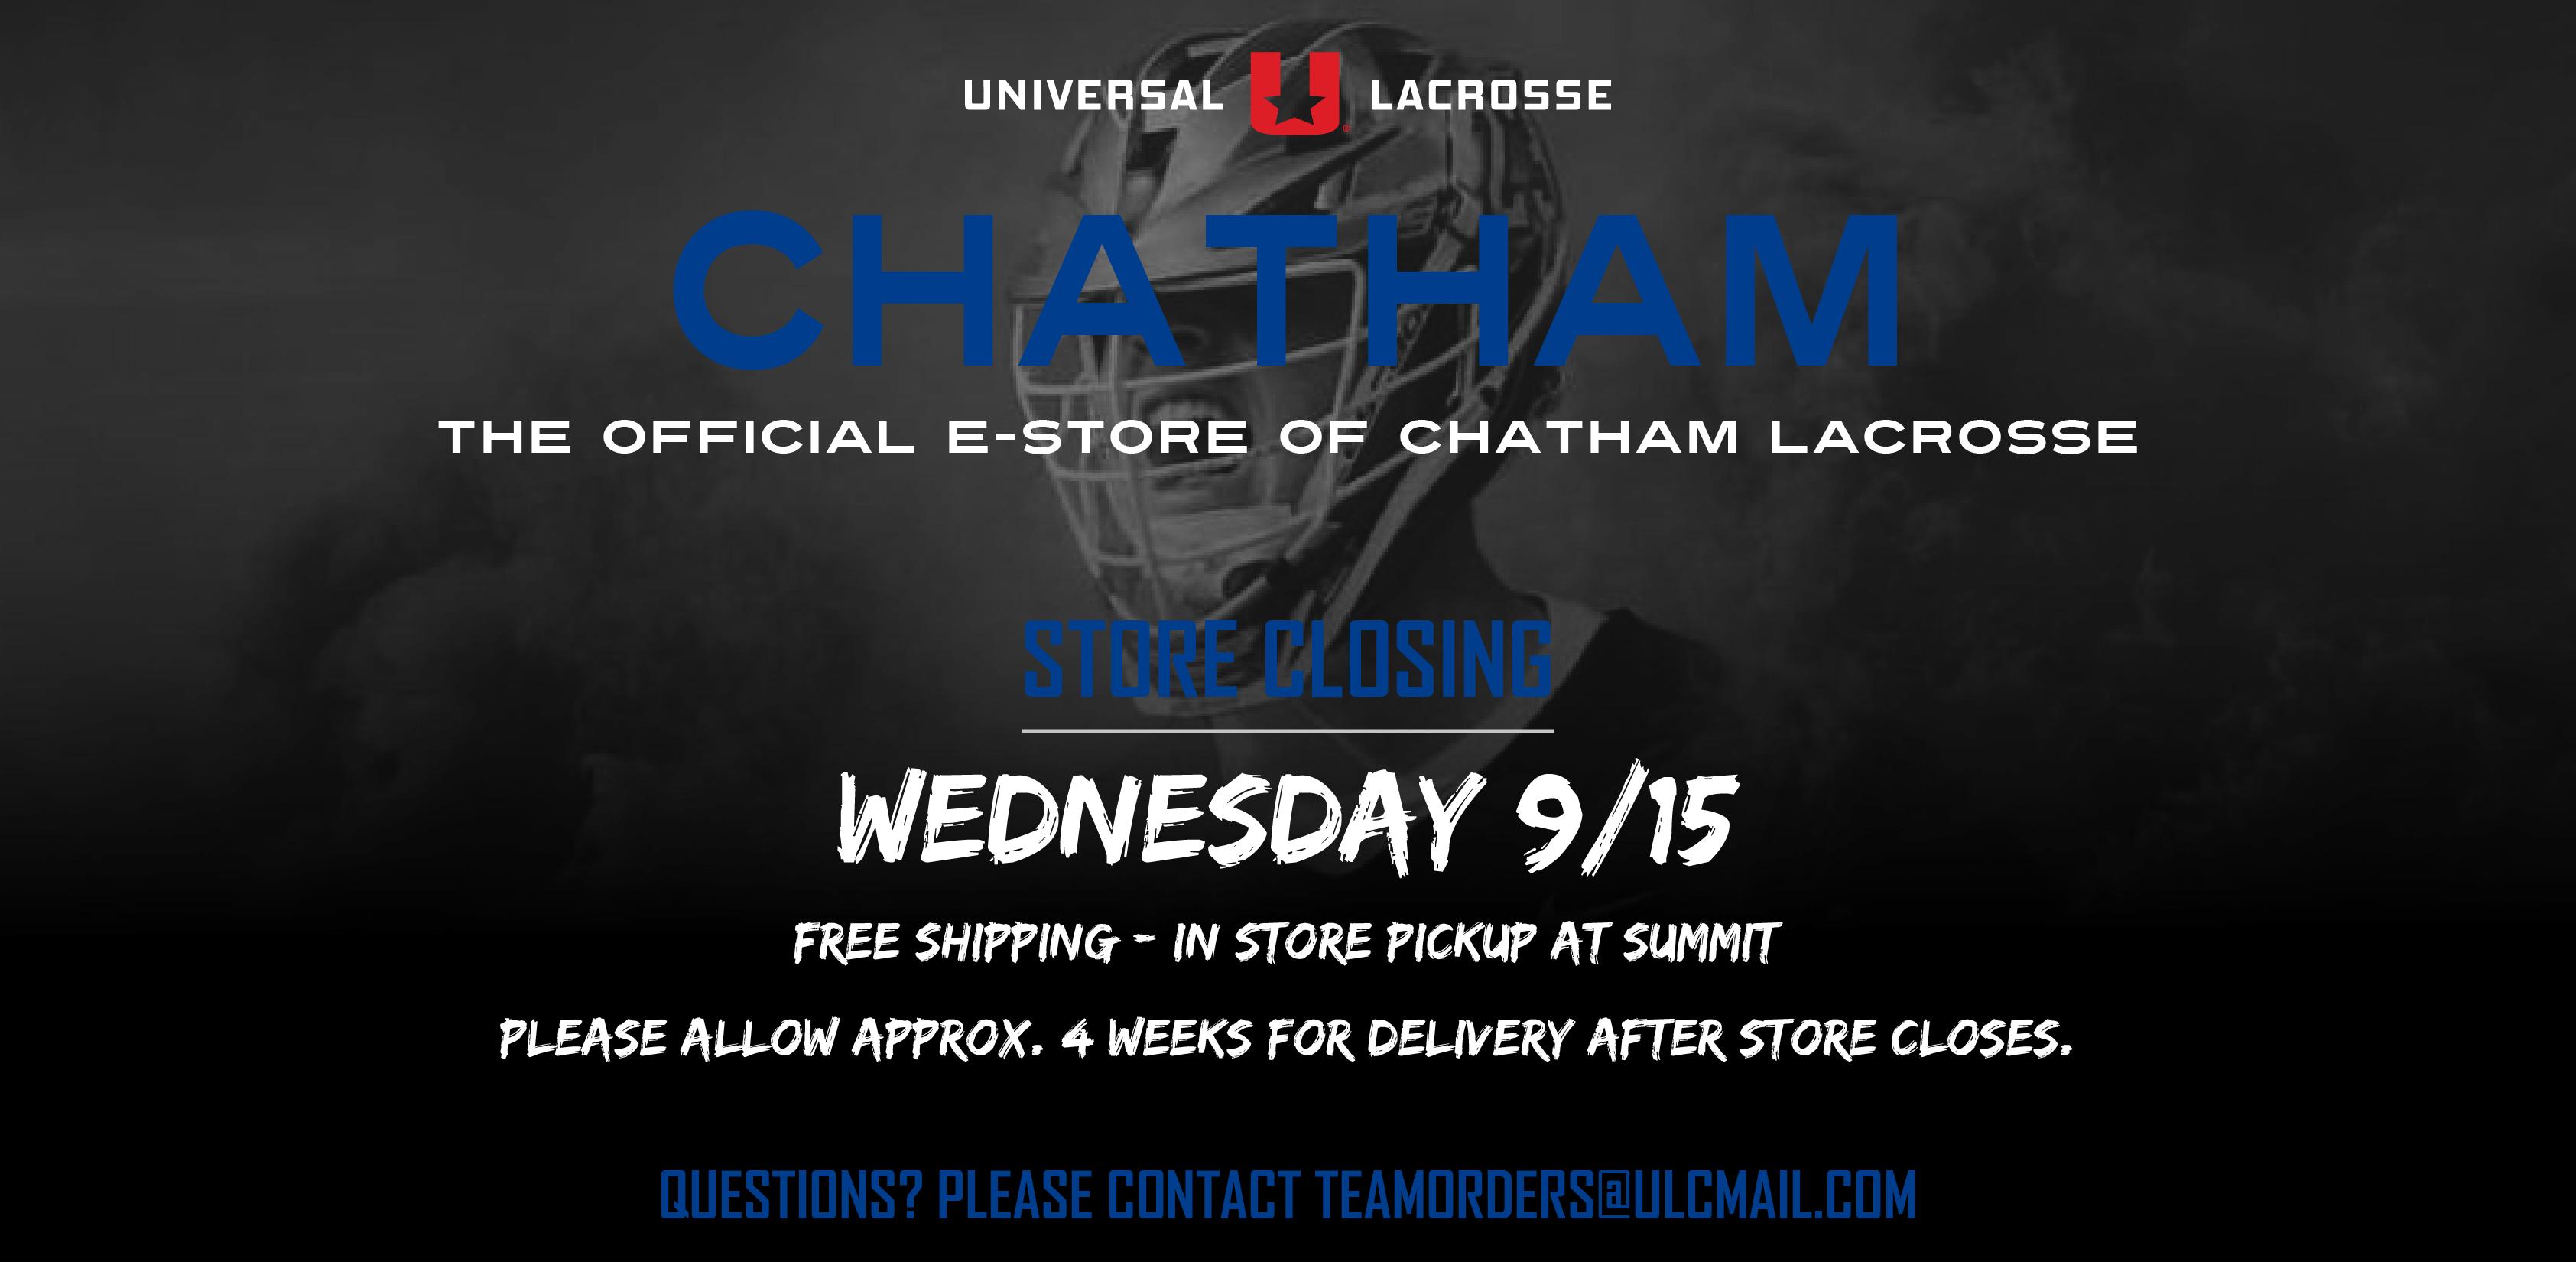 Chatham Hard Goods